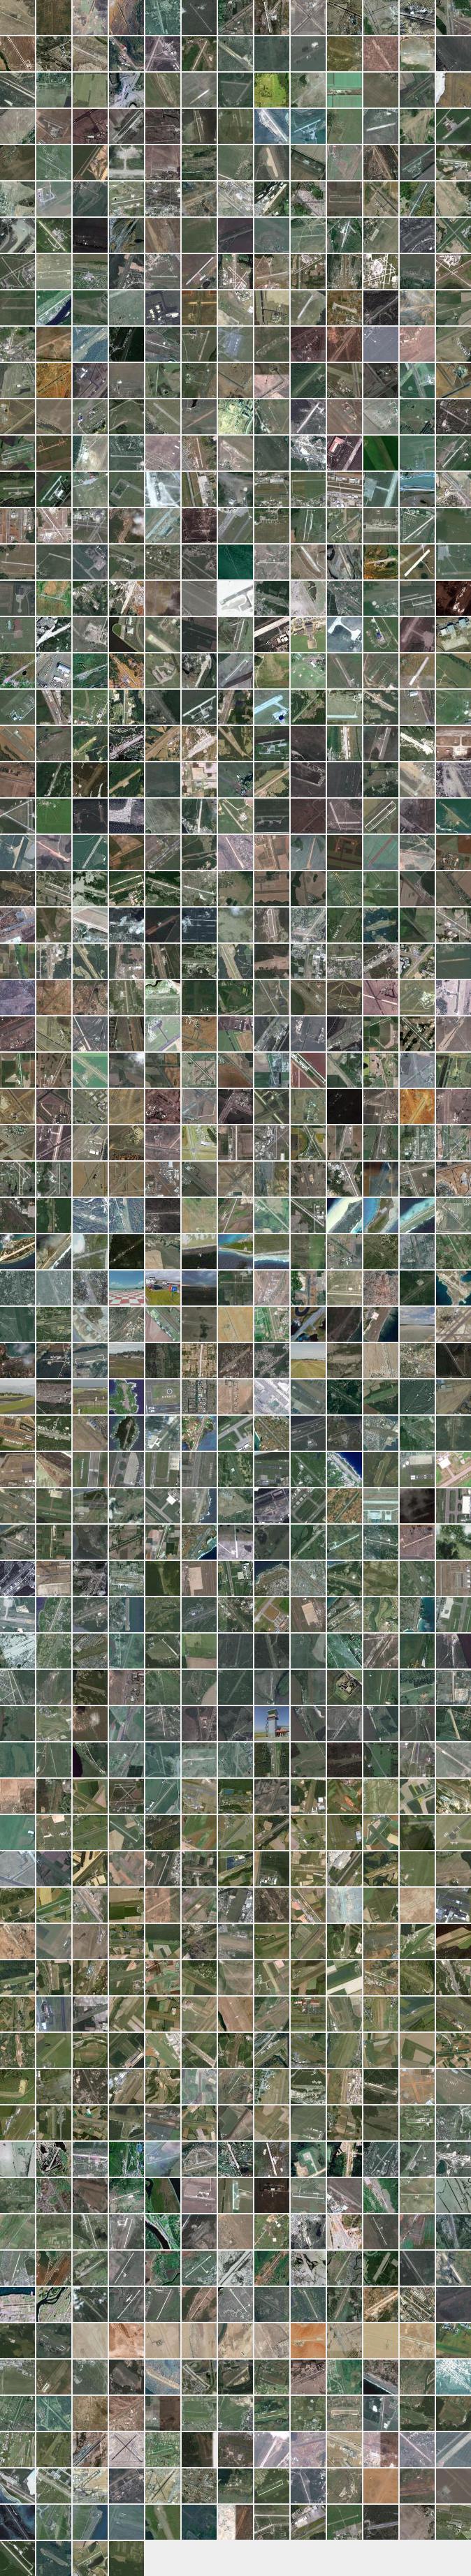 Maps in the Safari